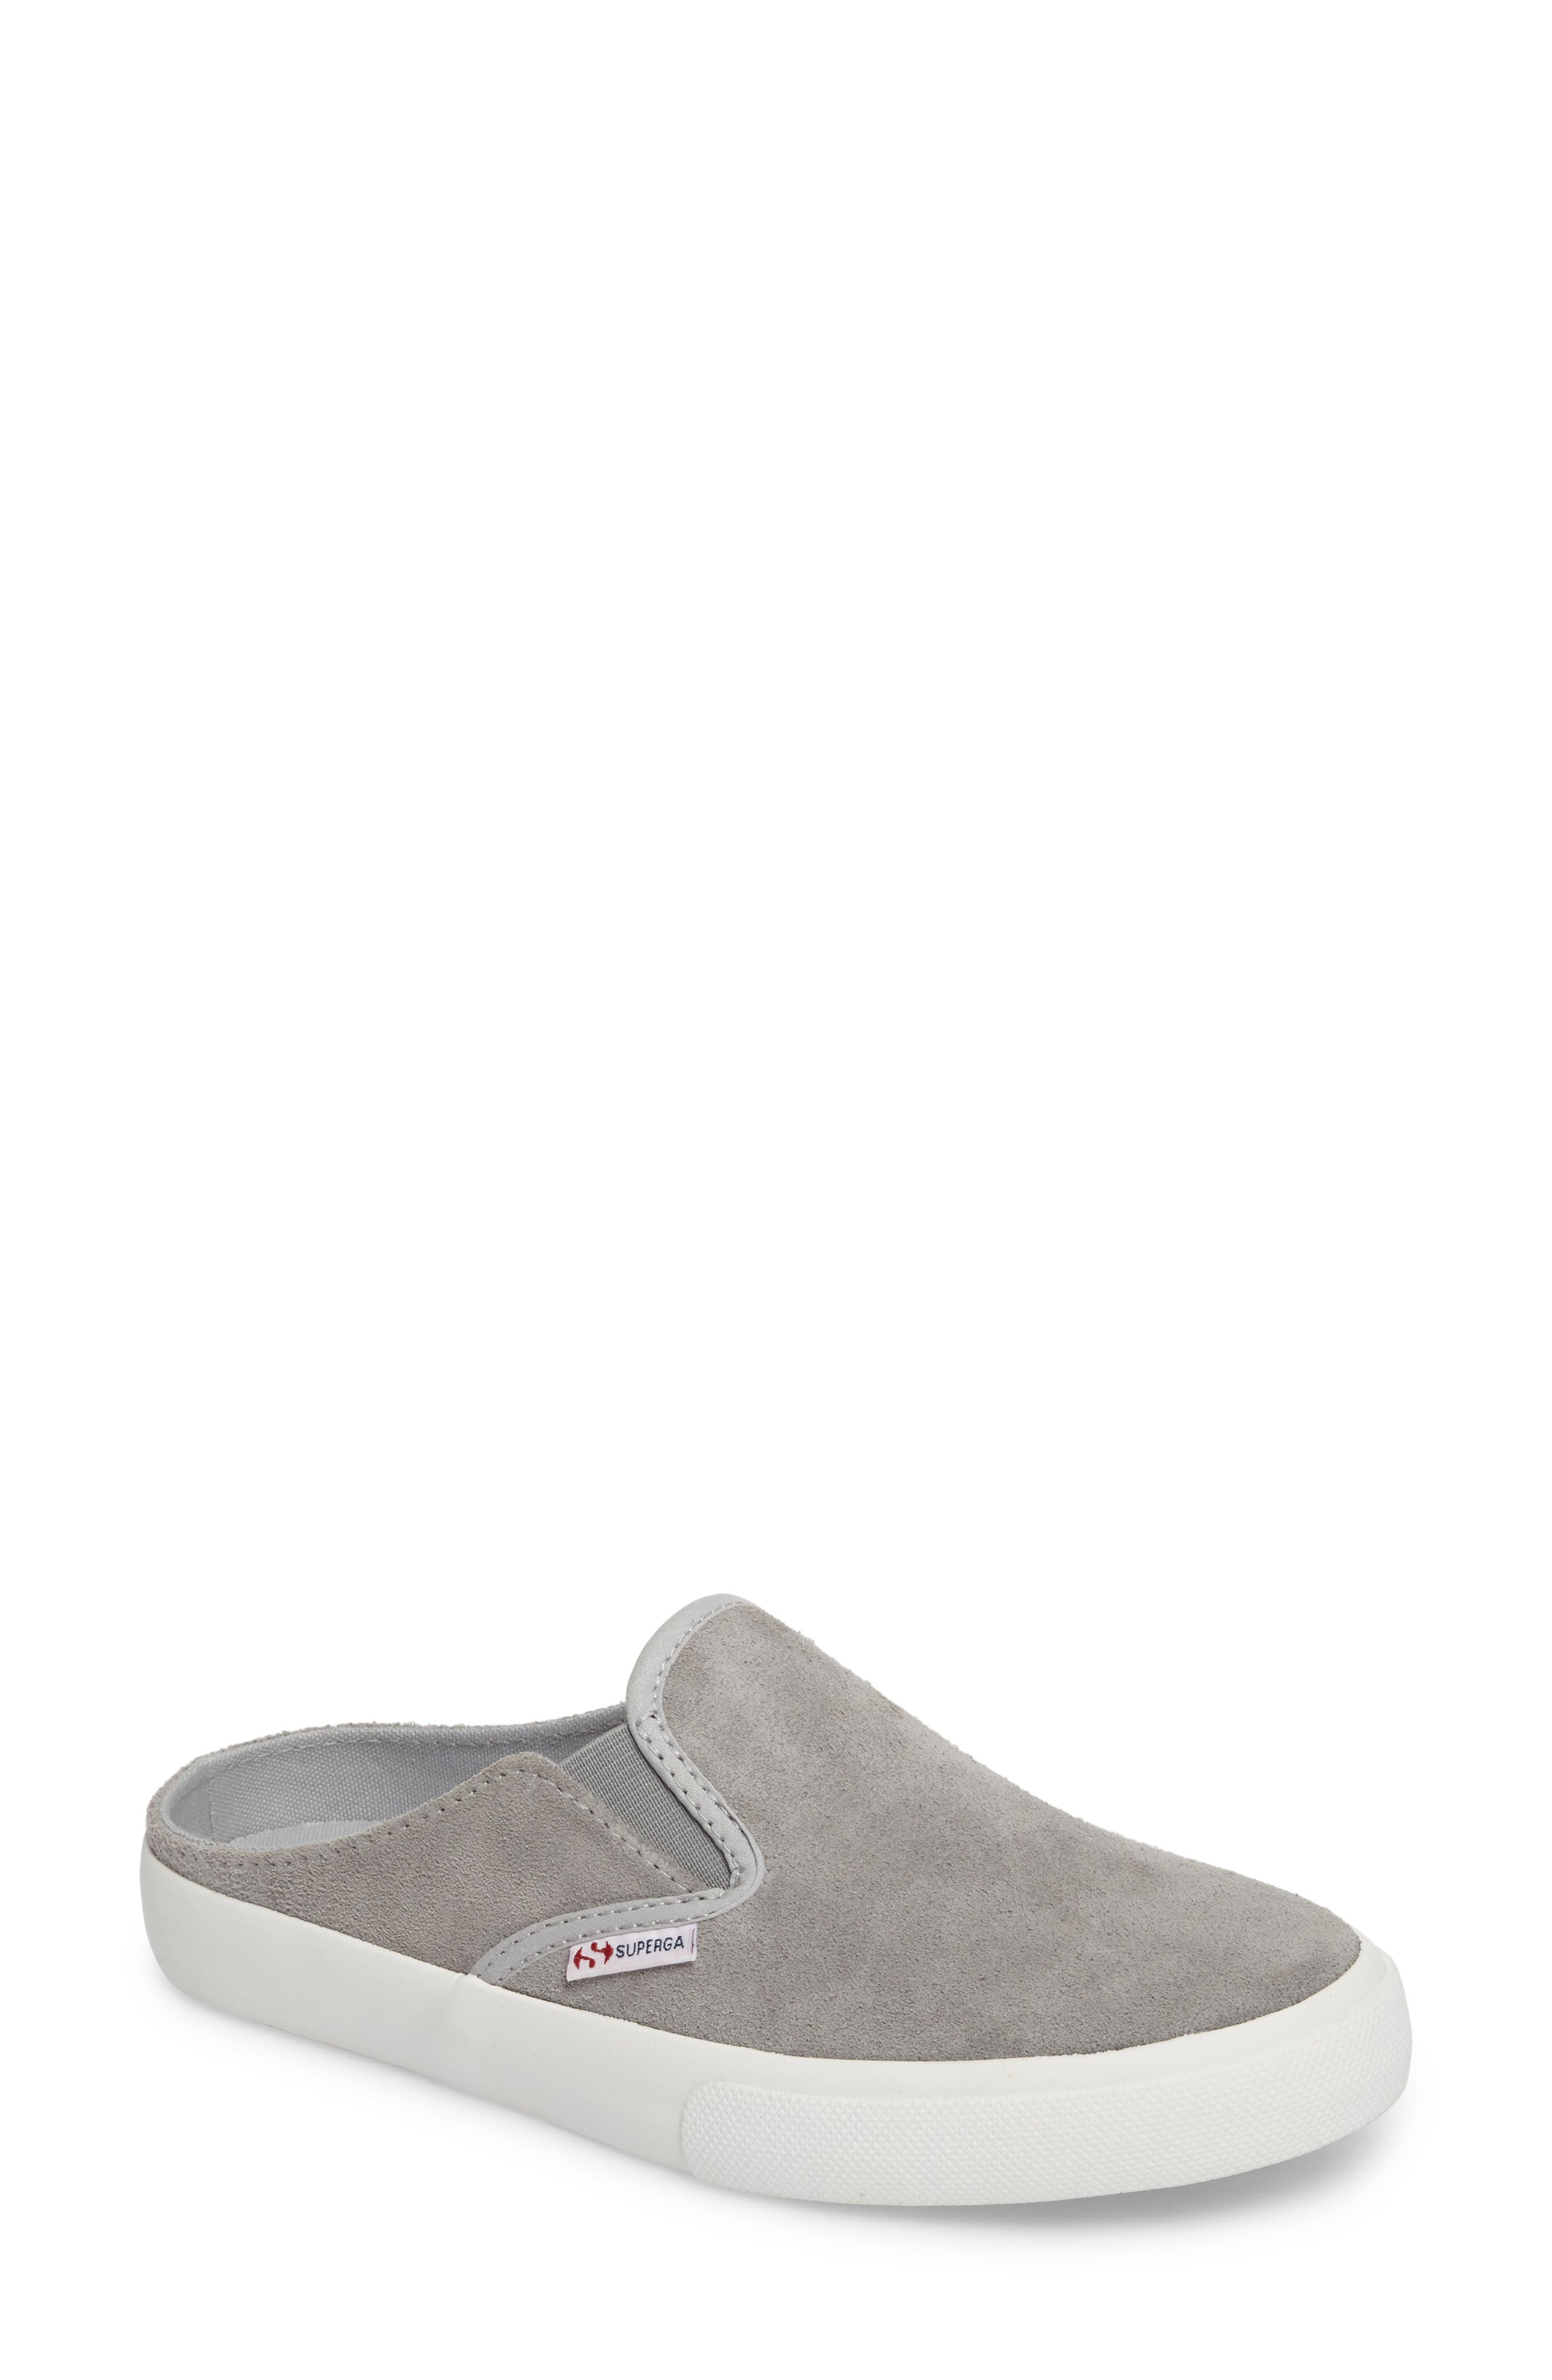 Slip-On Mule Sneaker,                             Main thumbnail 1, color,                             020